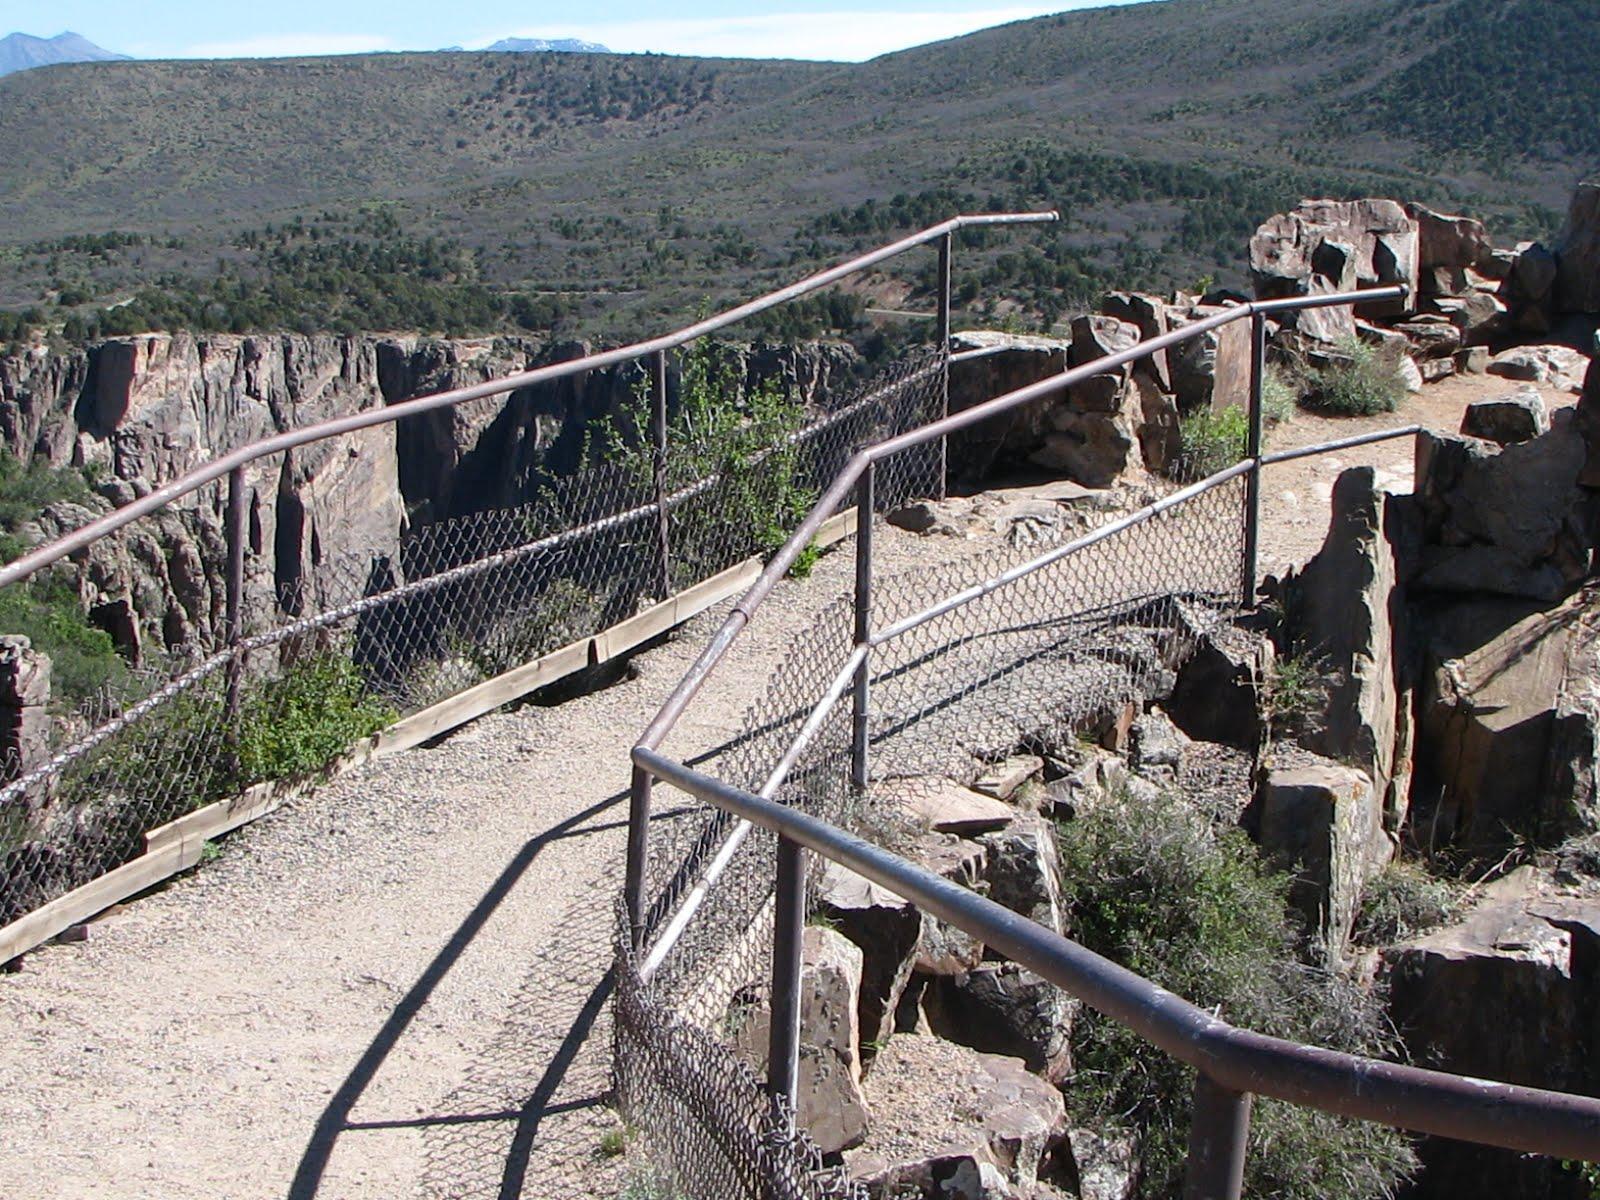 gjhikescom Black Canyon Pulpit Rock